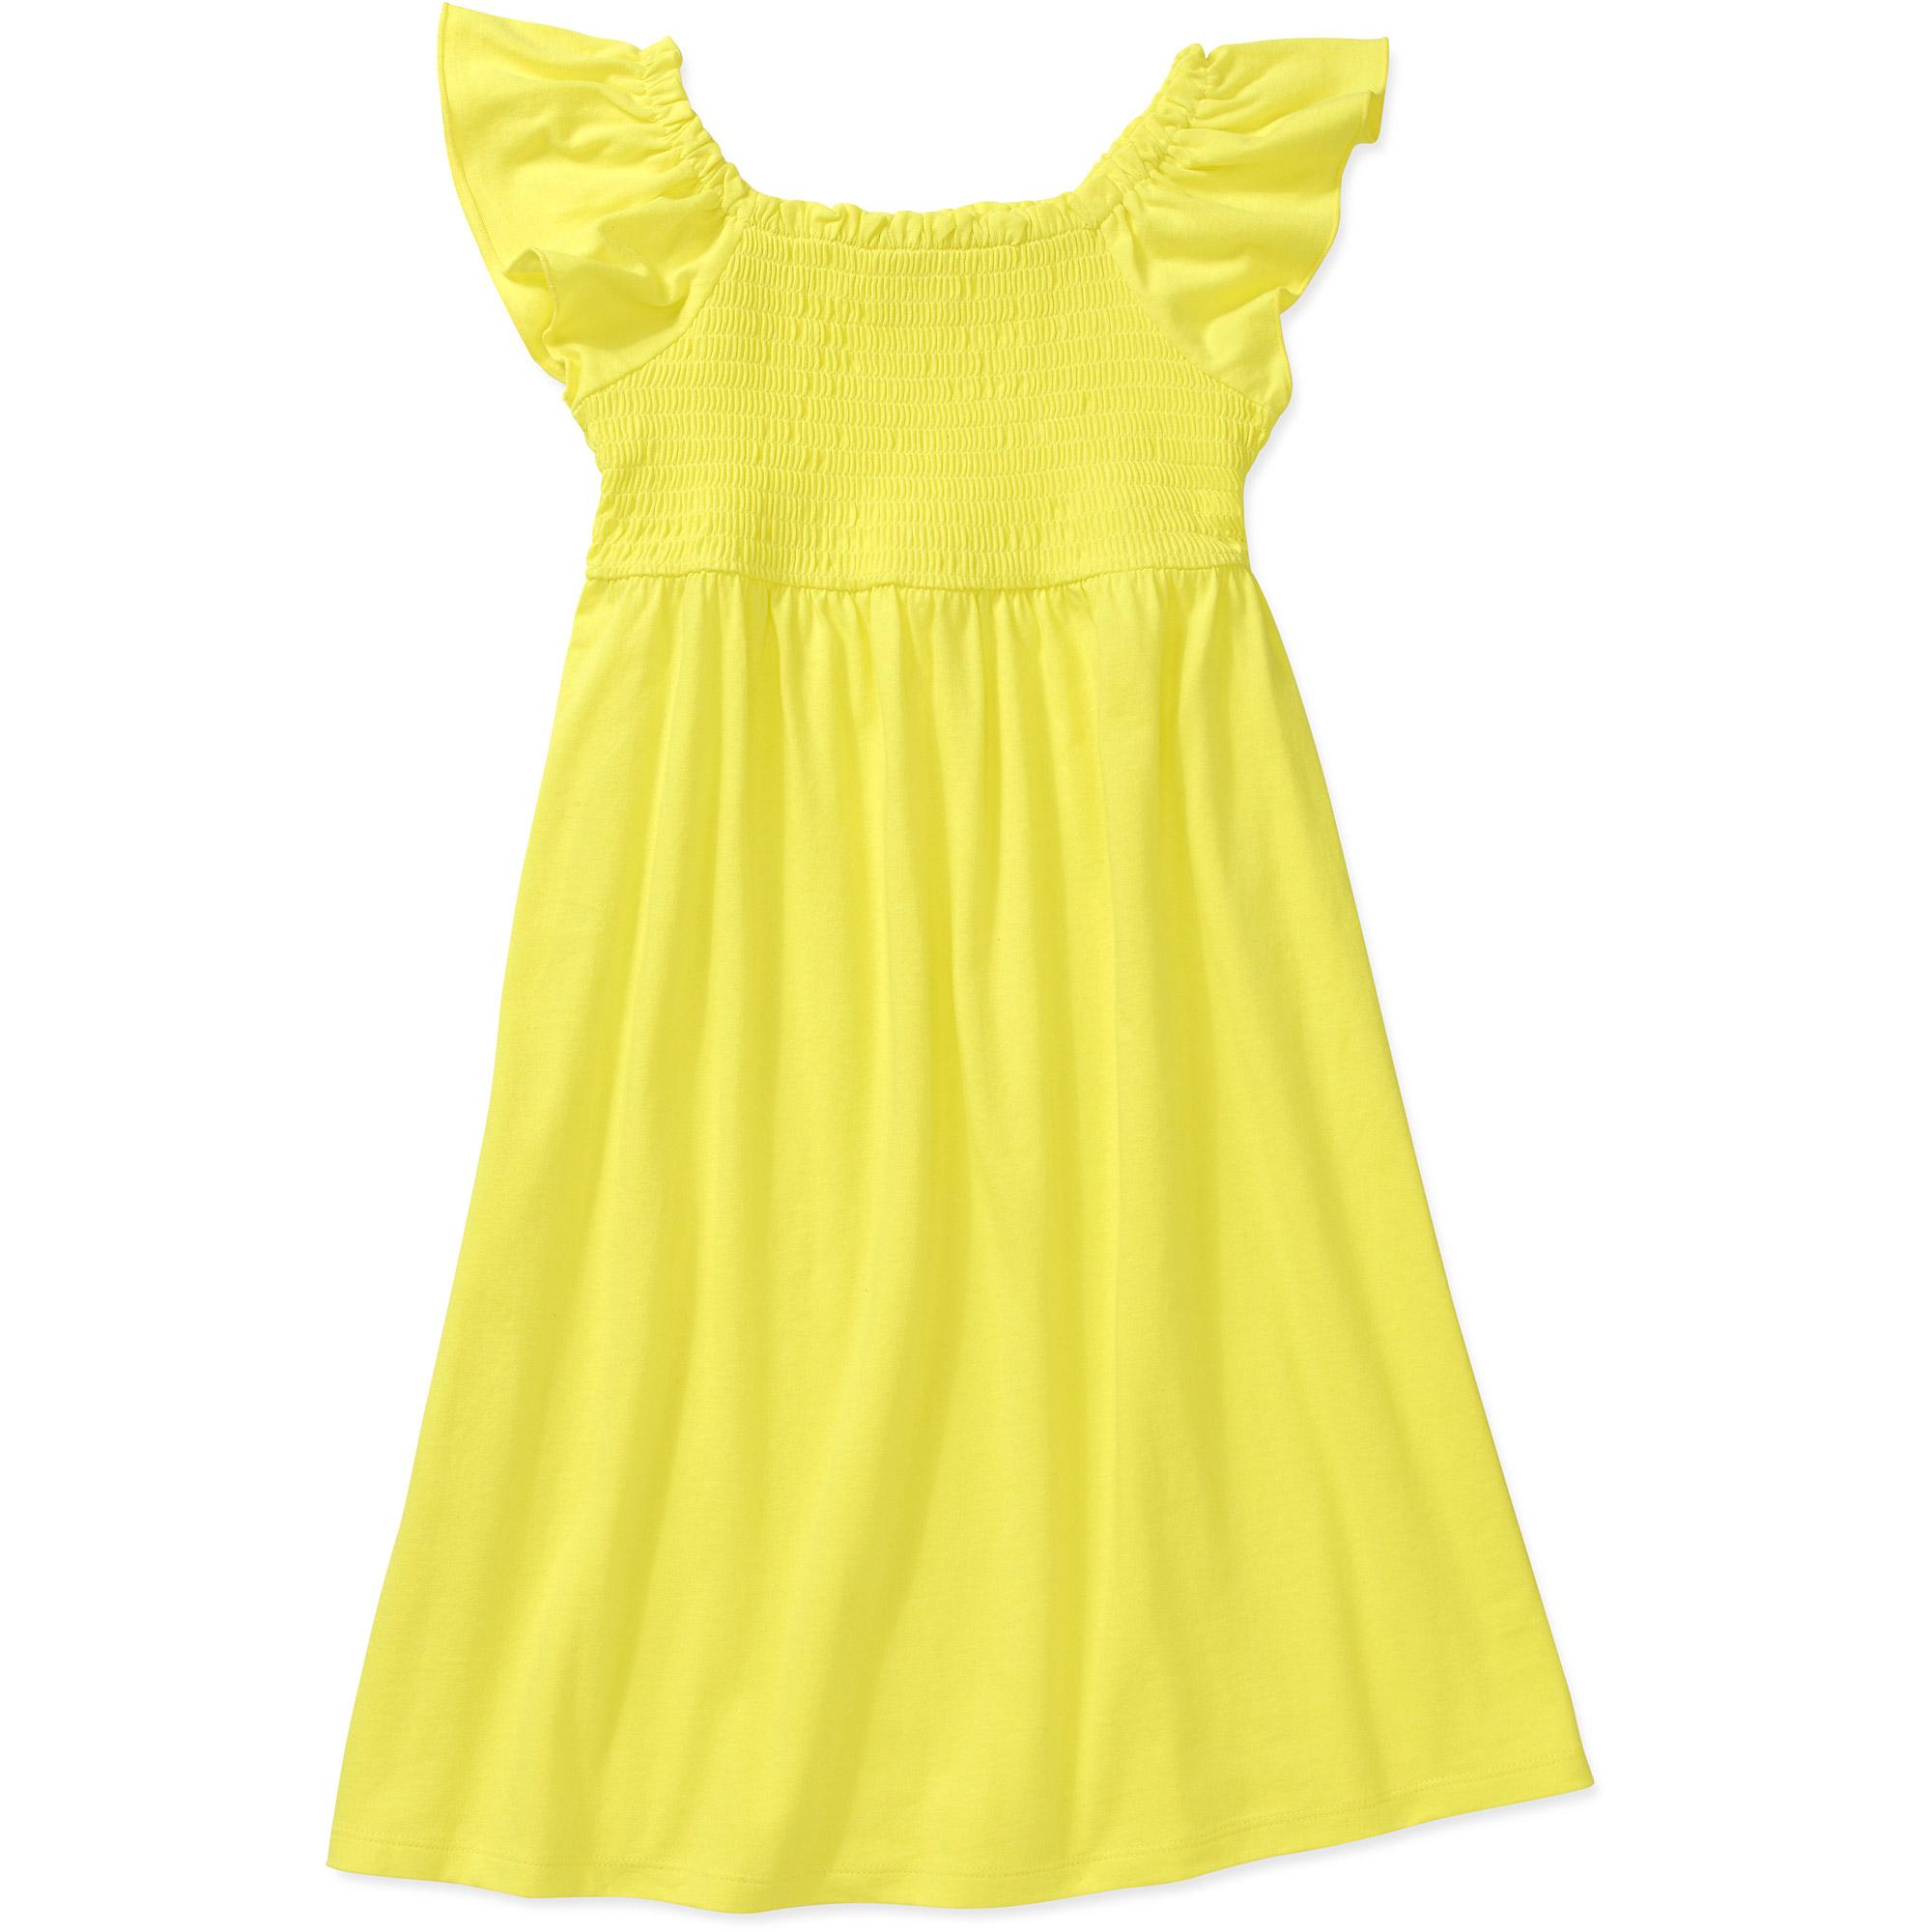 Faded Glory Girl Smocked Dress